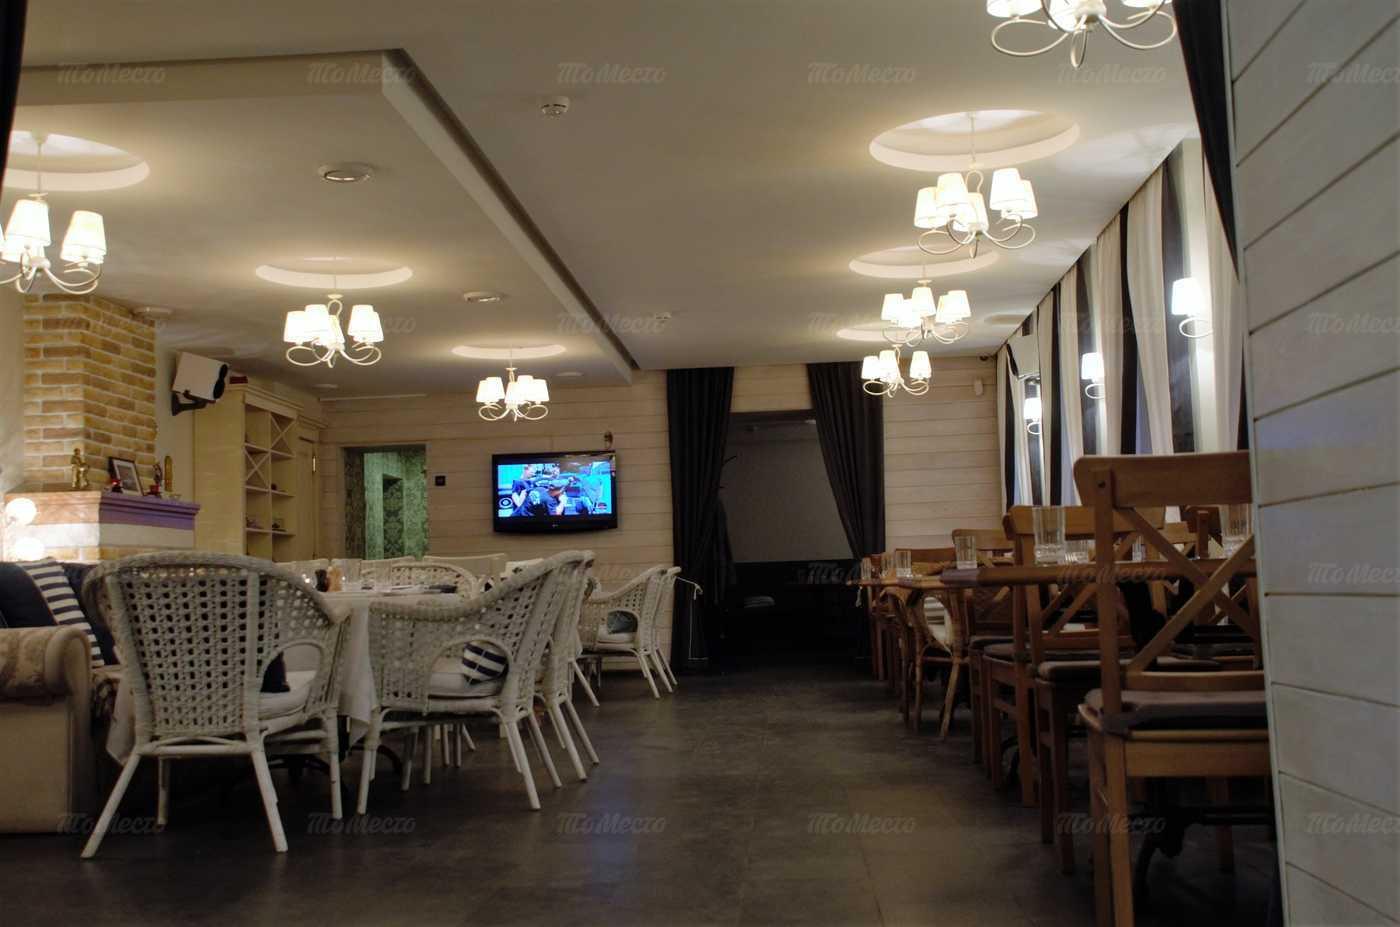 Меню ресторана Флагман на улице Марата